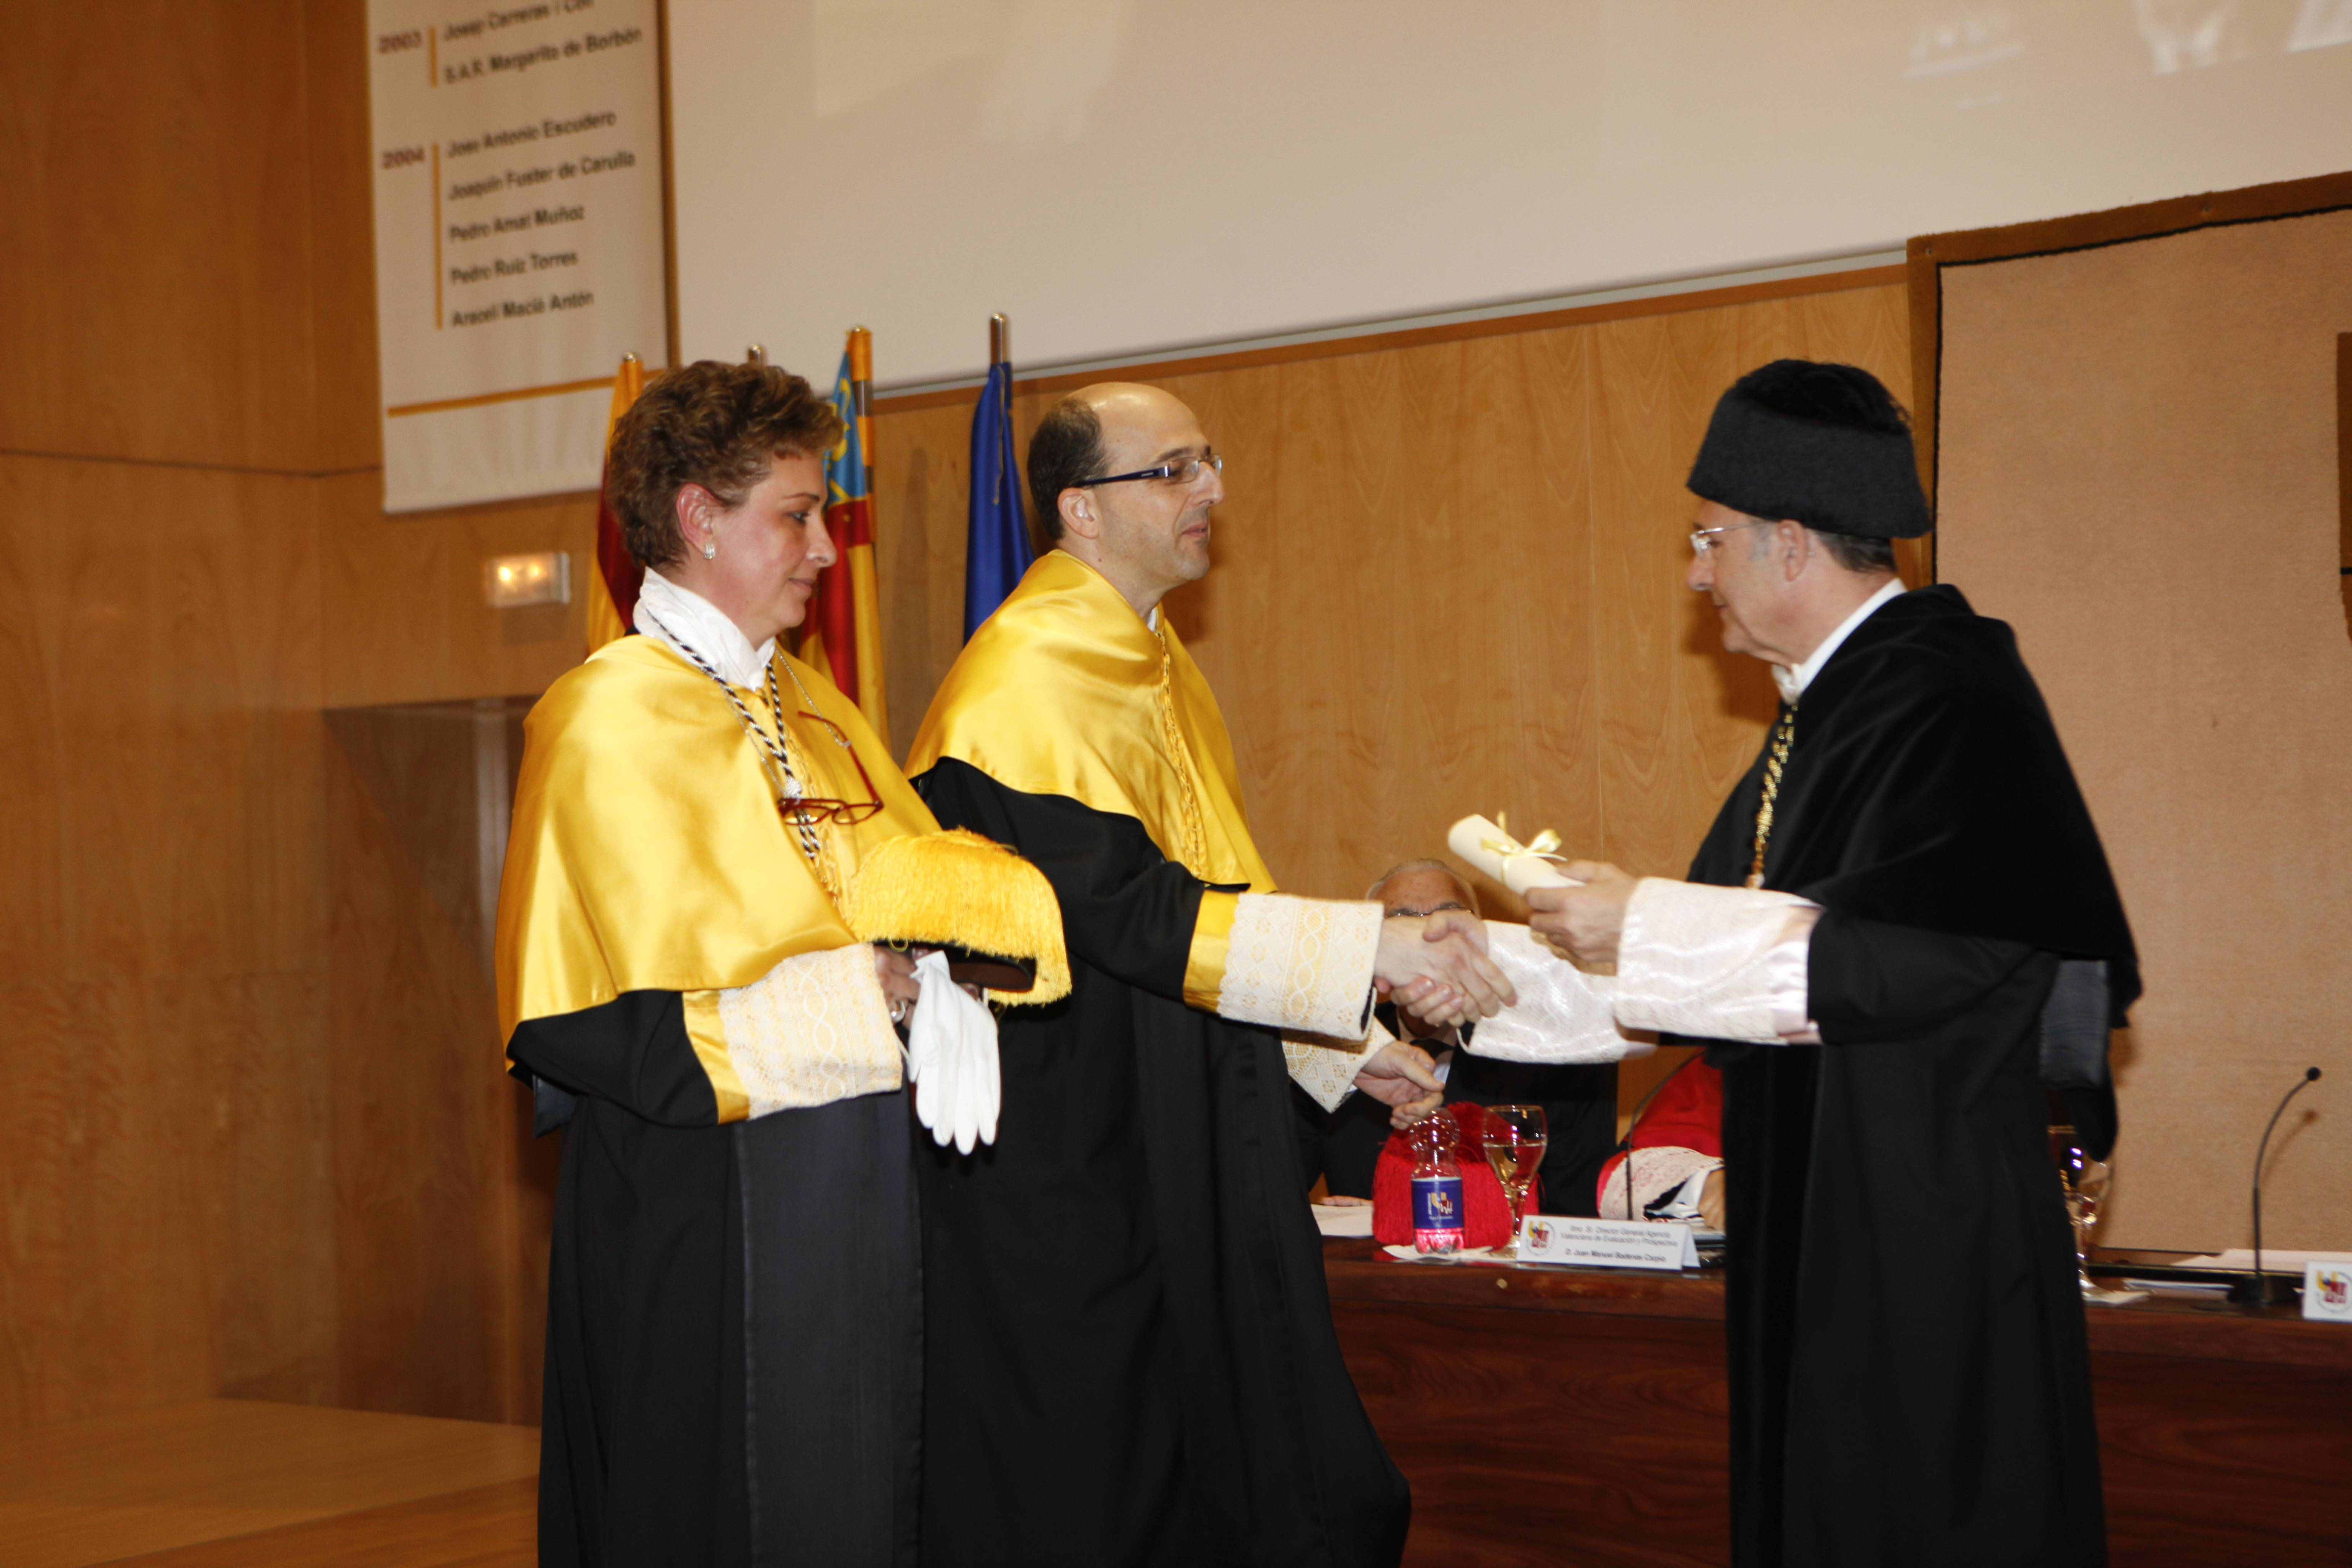 doctor-honoris-causa-luis-gamir_mg_1120.jpg